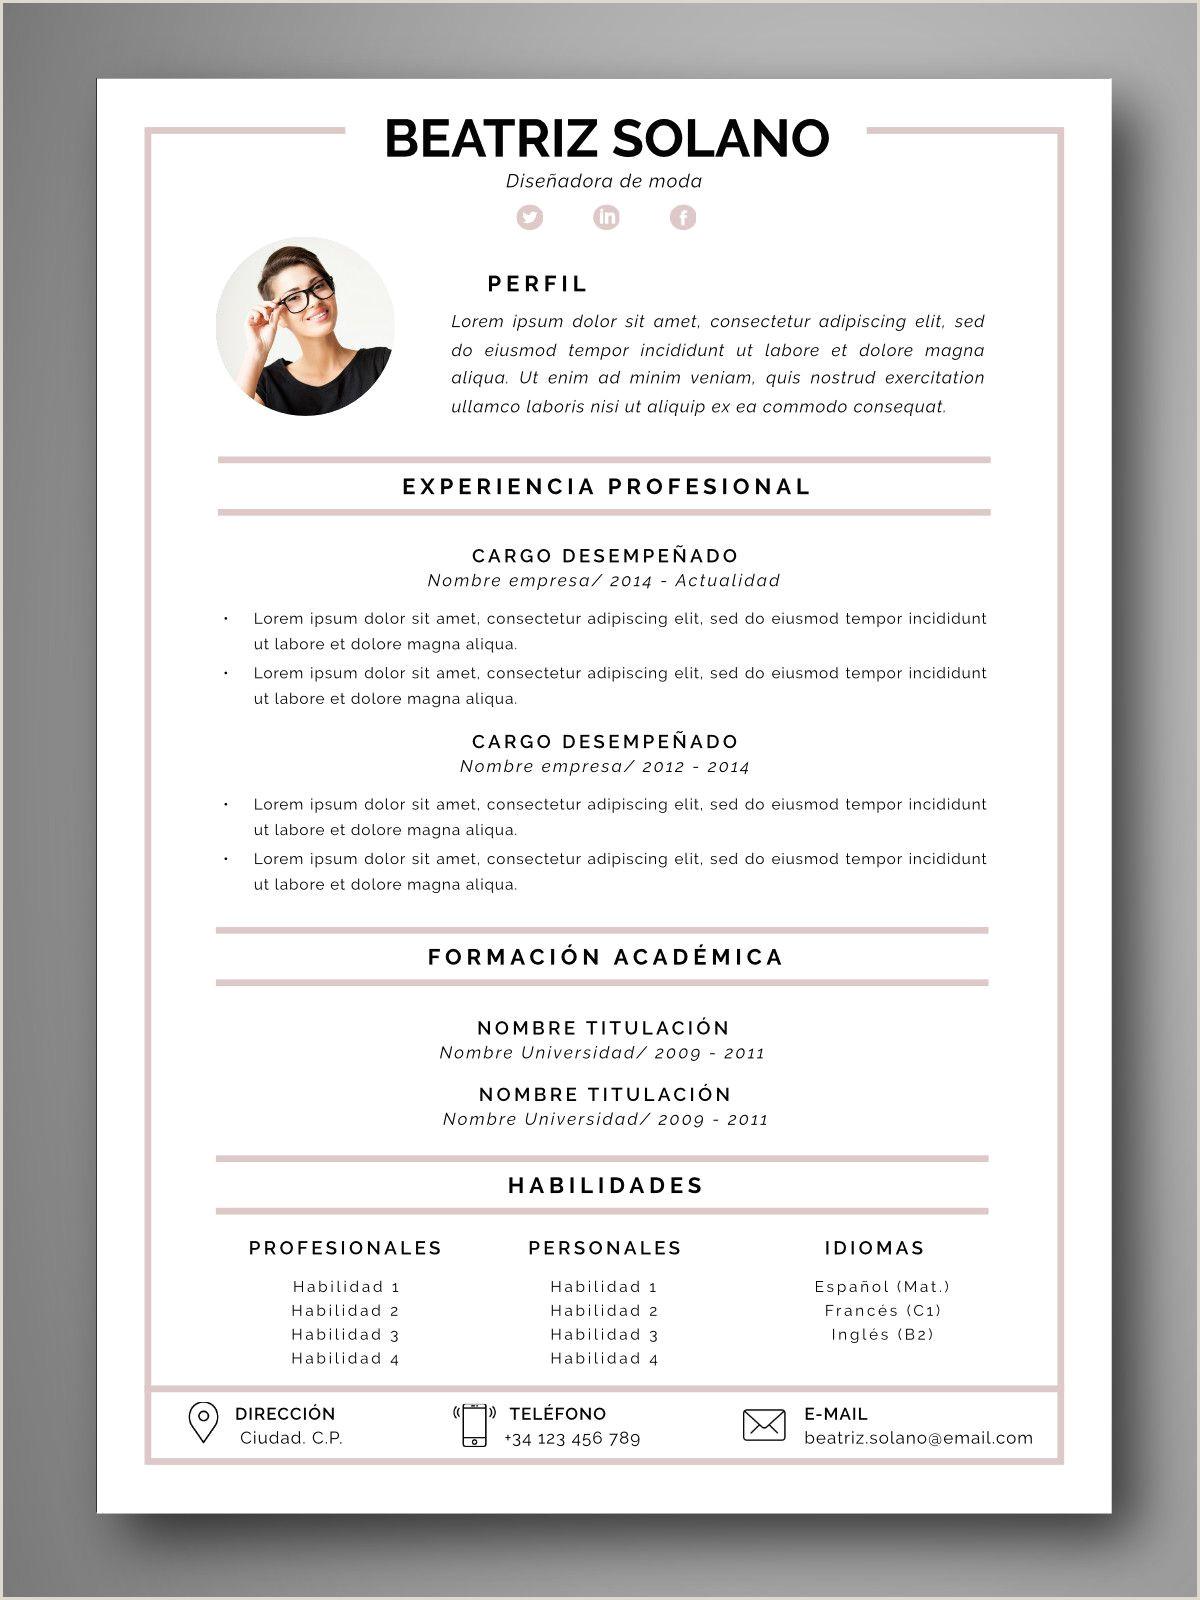 Curriculum Vitae formato Word Para Rellenar Gratis Venezuela Leer En Lnea Curriculum Vitae Modelo Para Pletar En Word